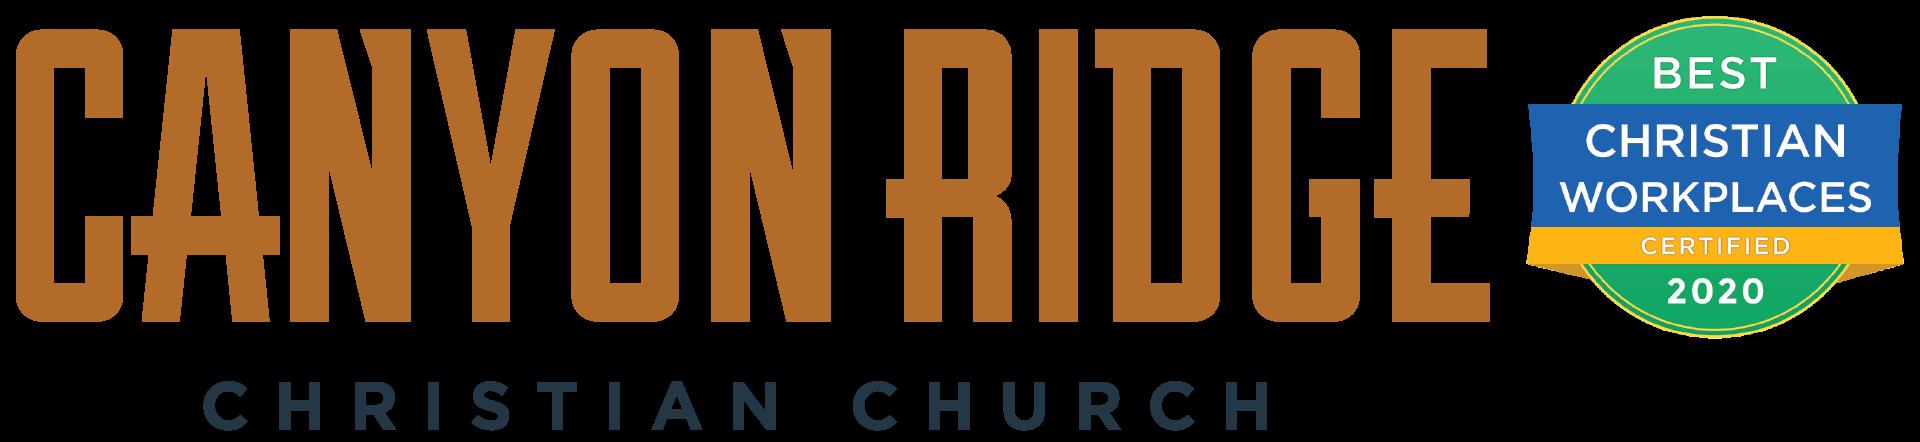 Canyon Ridge Christian Church Inc - Job Opportunities